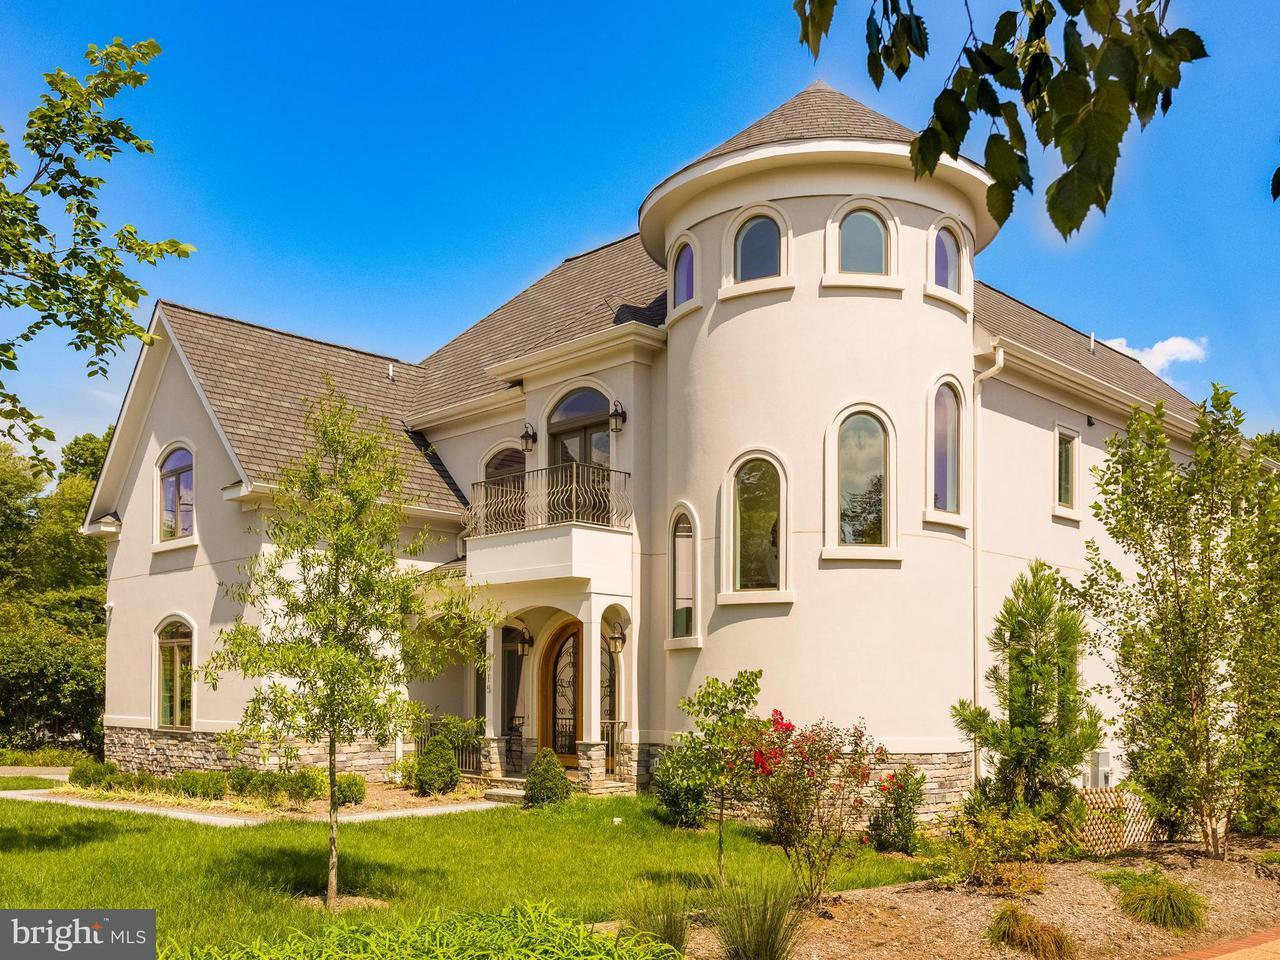 Single Family Home for Sale at 2015 ARLINGTON RIDGE Road 2015 ARLINGTON RIDGE Road Arlington, Virginia 22202 United States